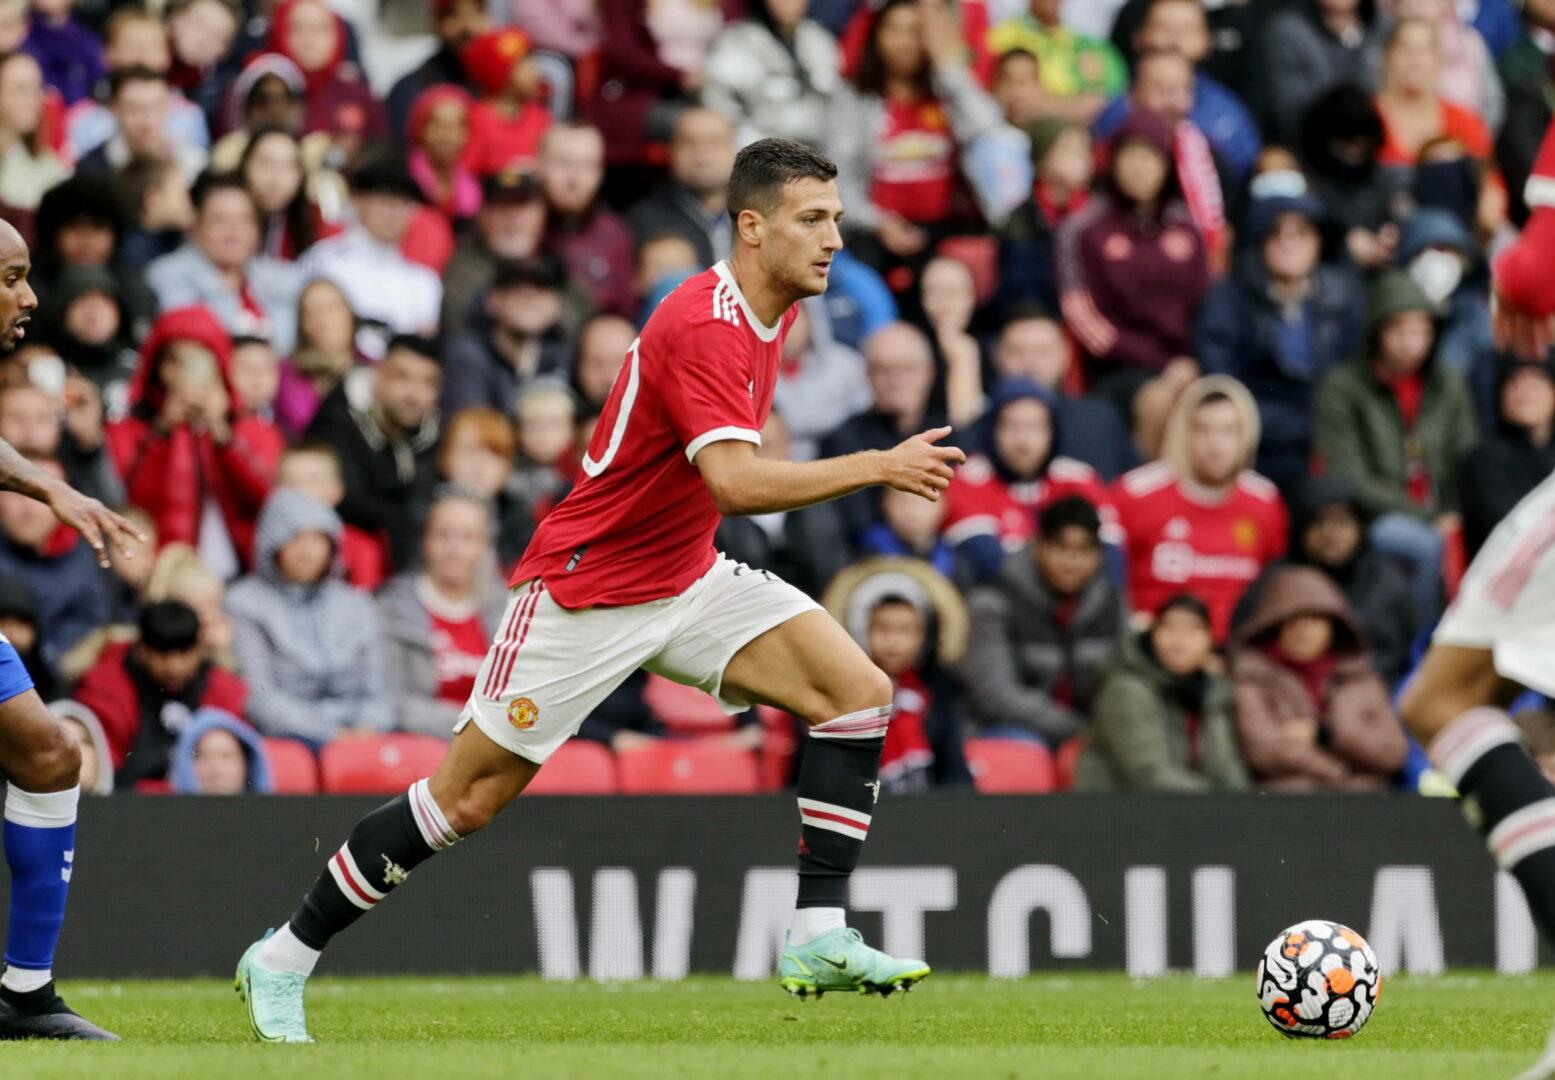 Diogo Dalot von Manchester United